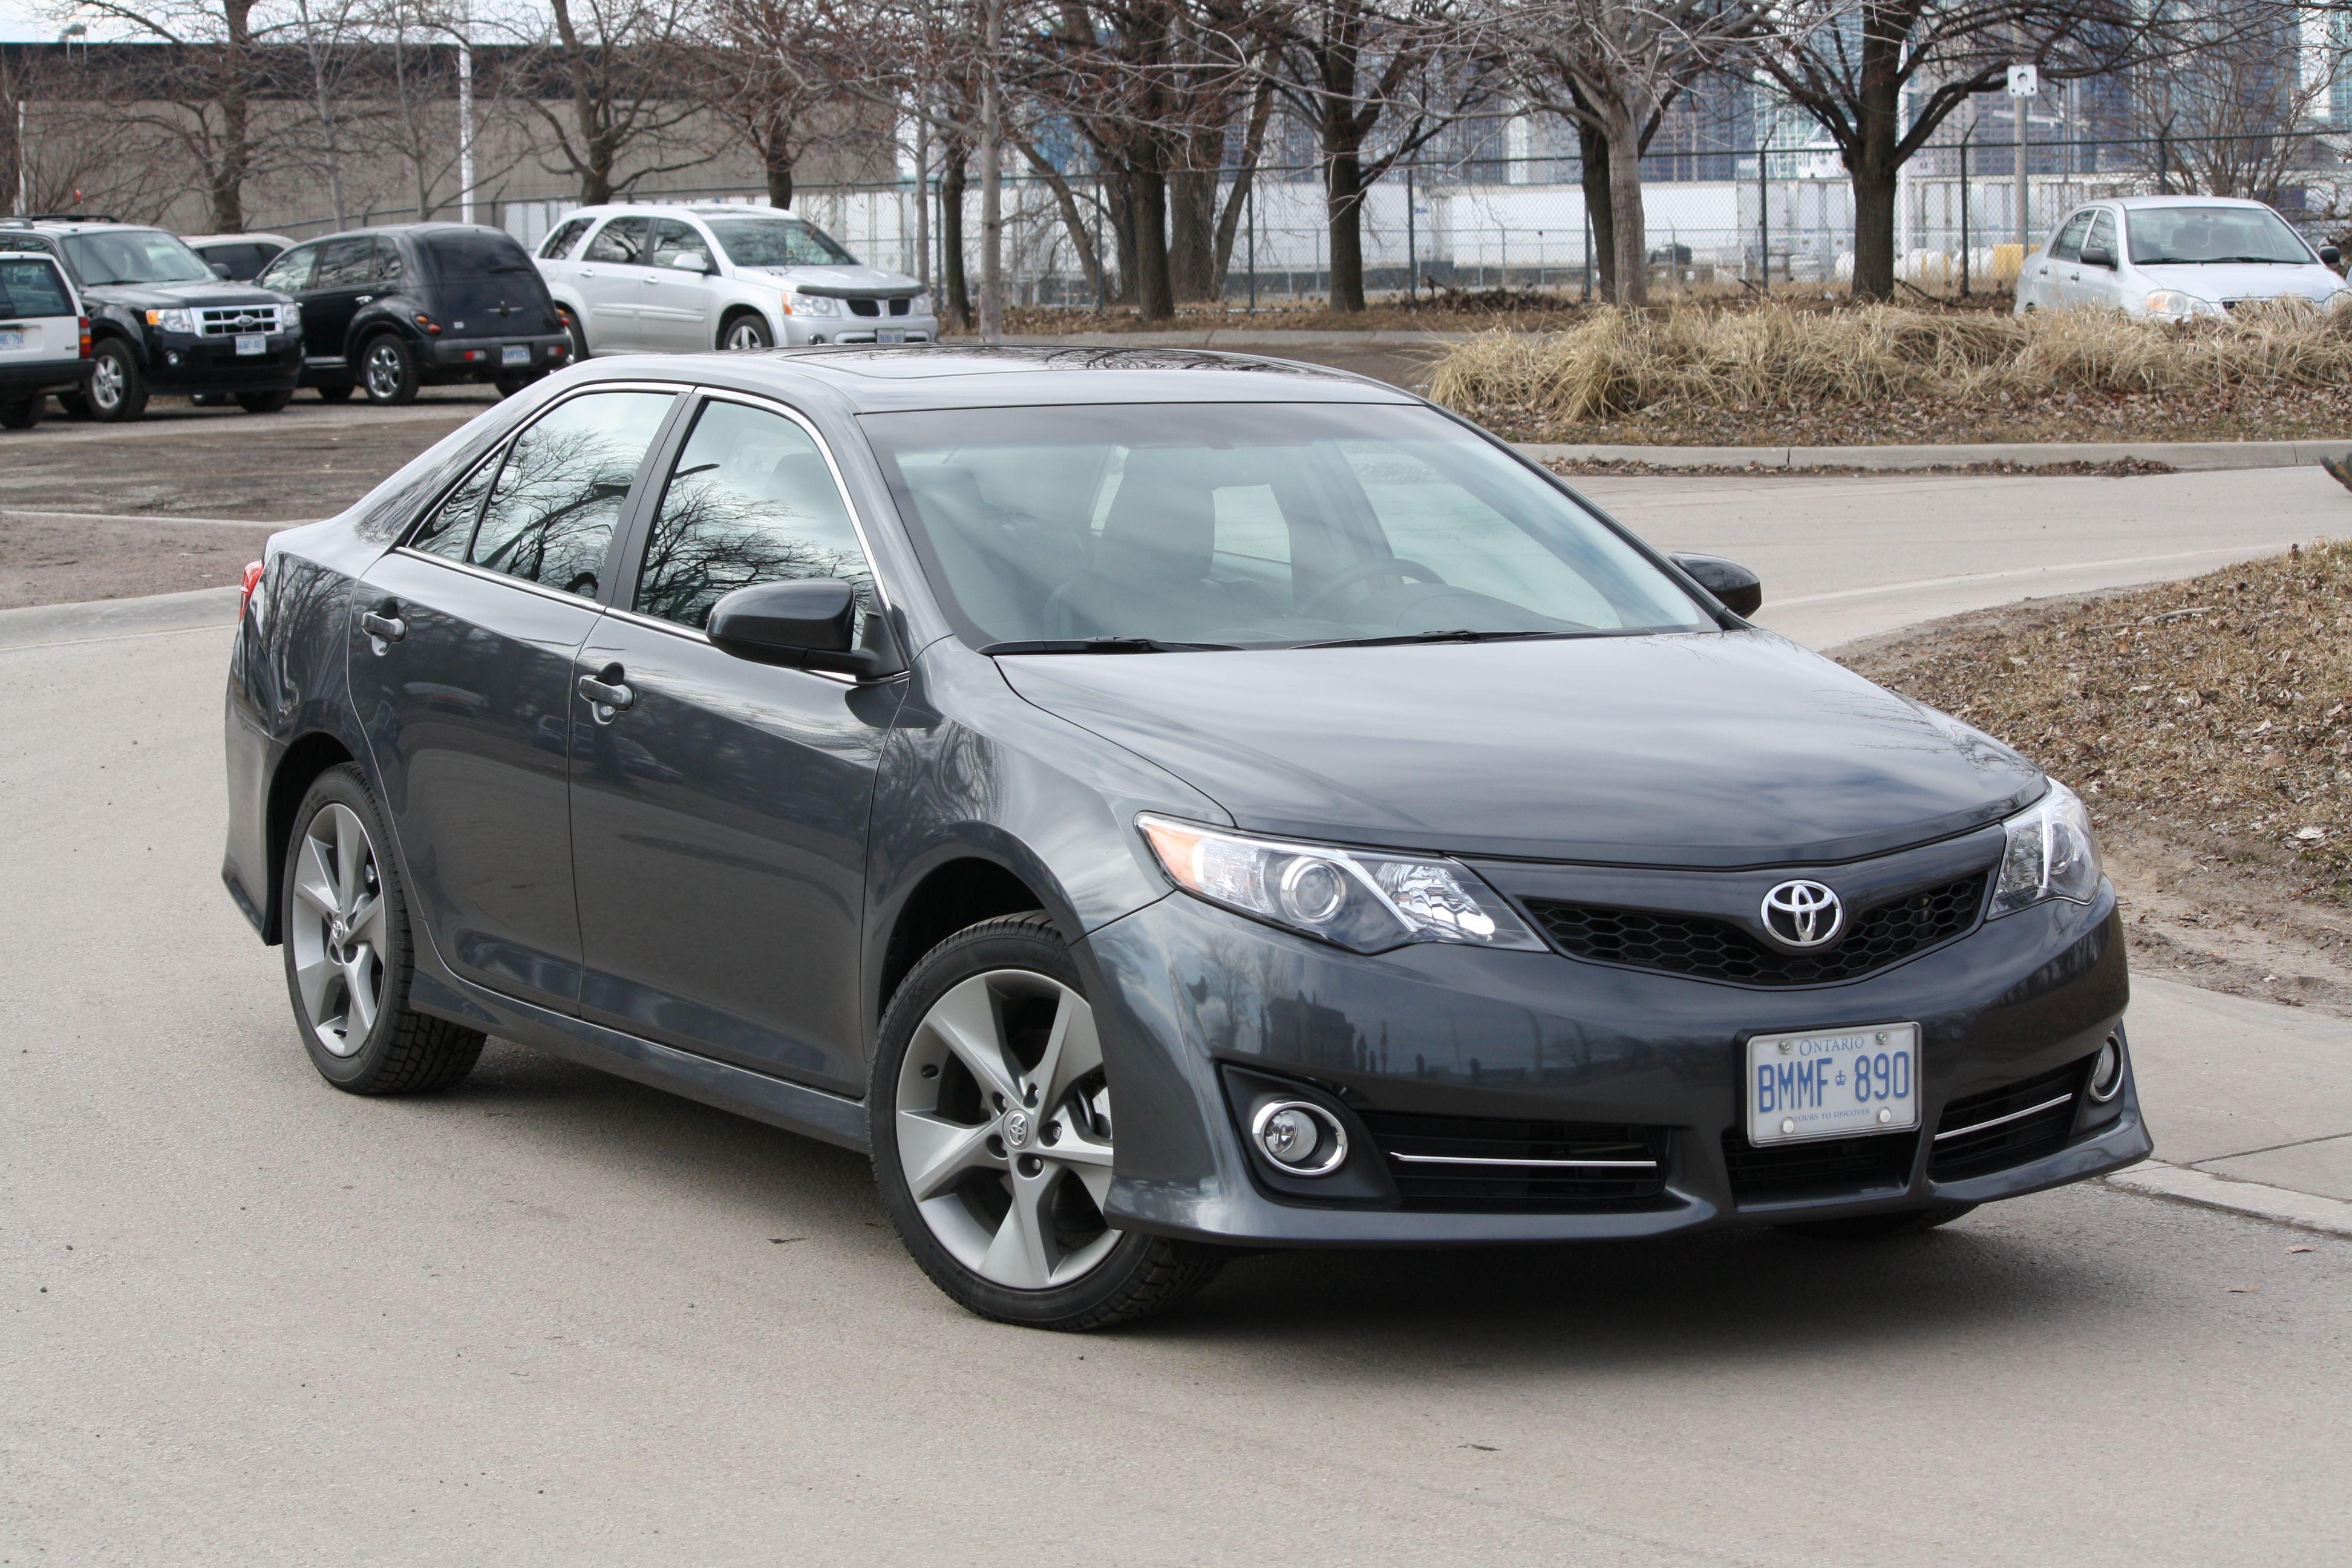 Gray Toyota Camry Solara SE Sport